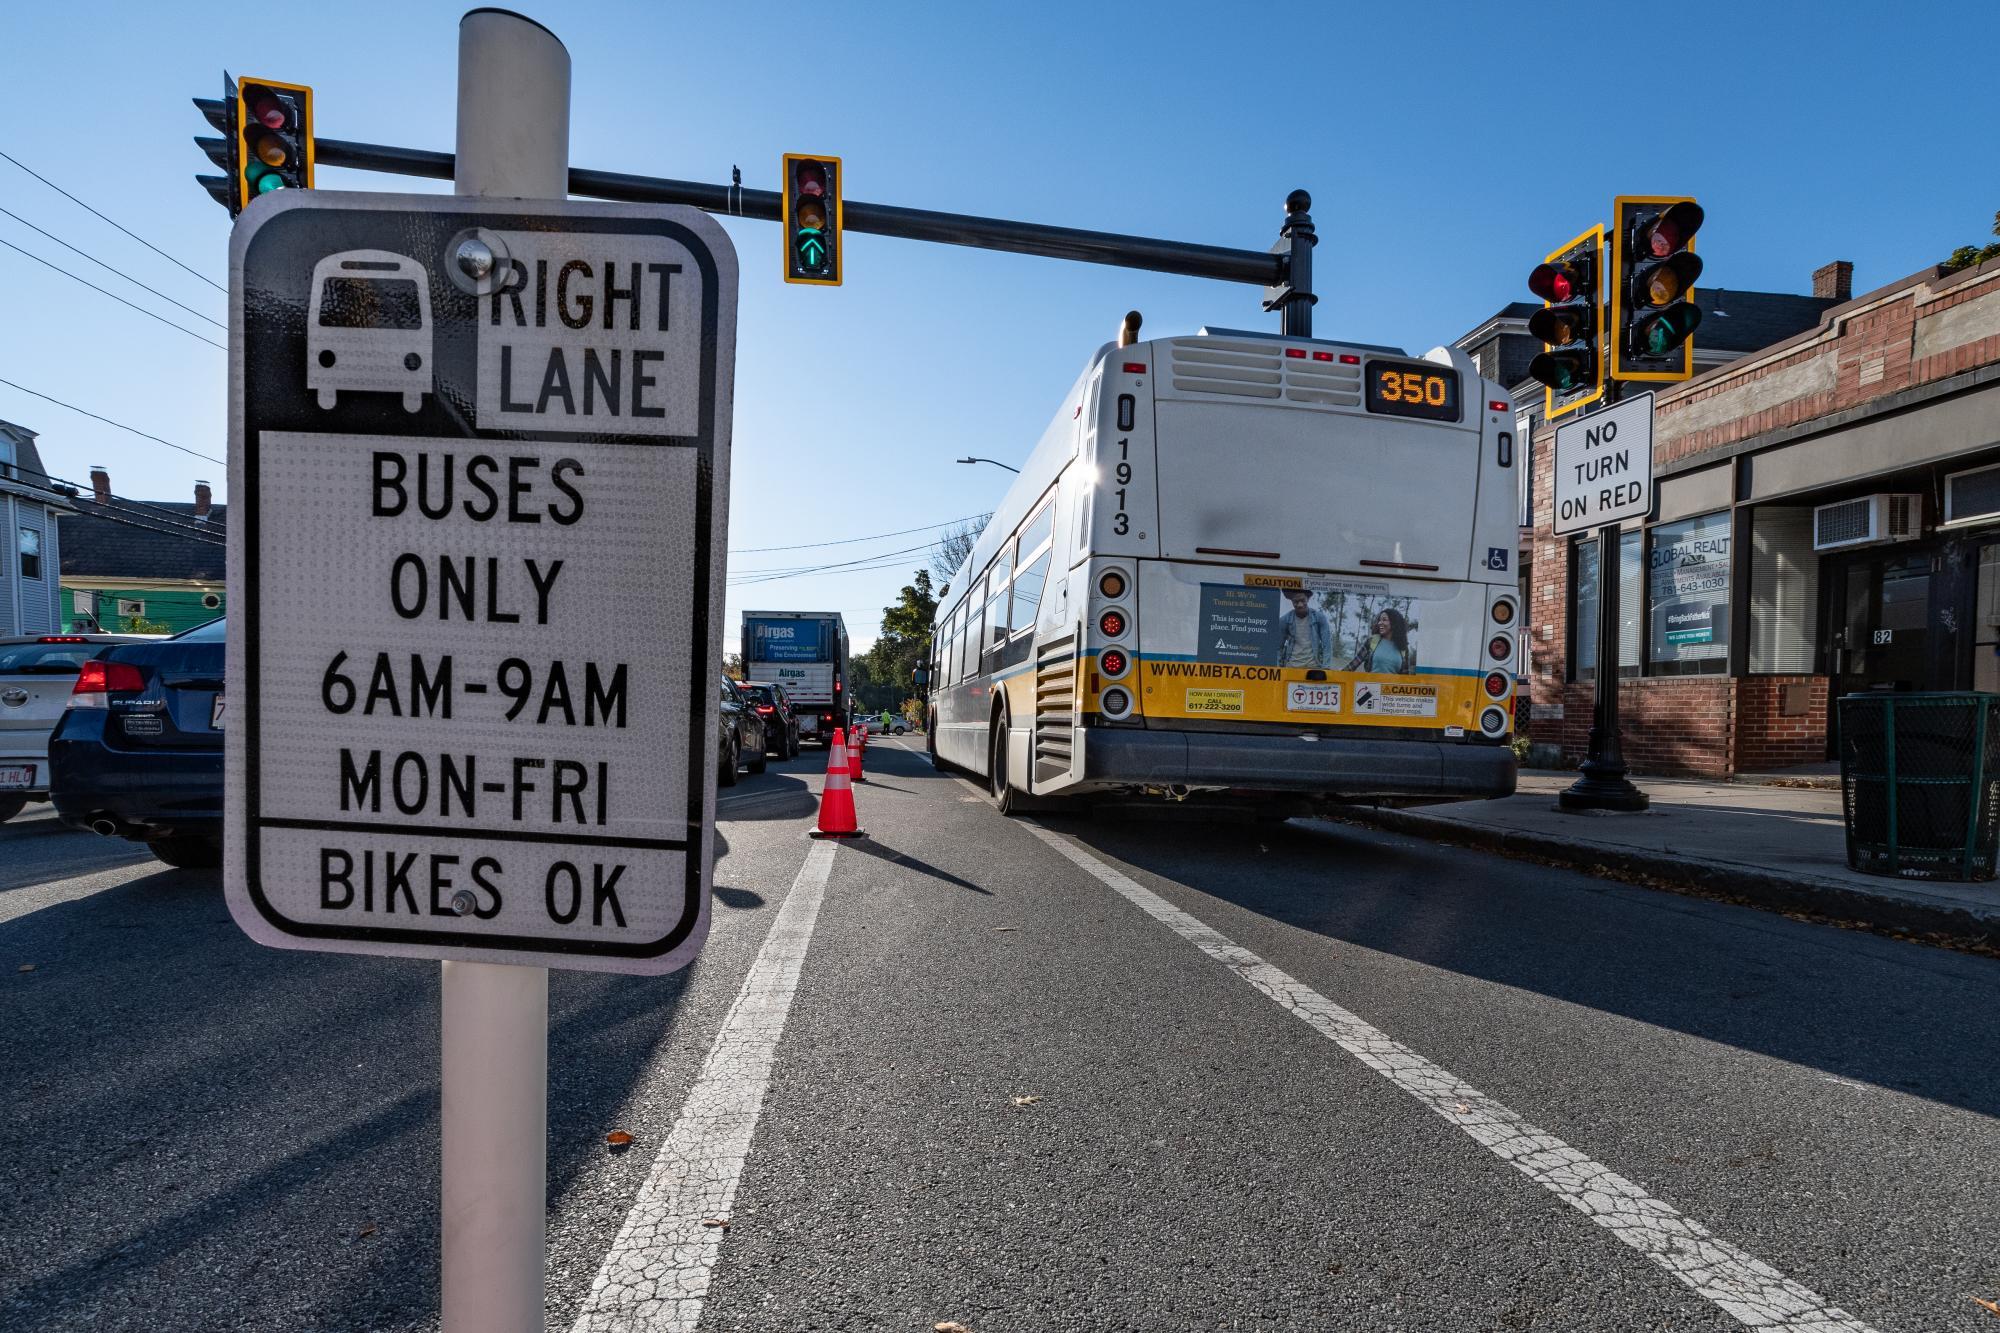 """Right Lane | Buses Only | 6 AM - 9 AM | Mon-Fri | Bikes OK"" sign during the Arlington pilot."